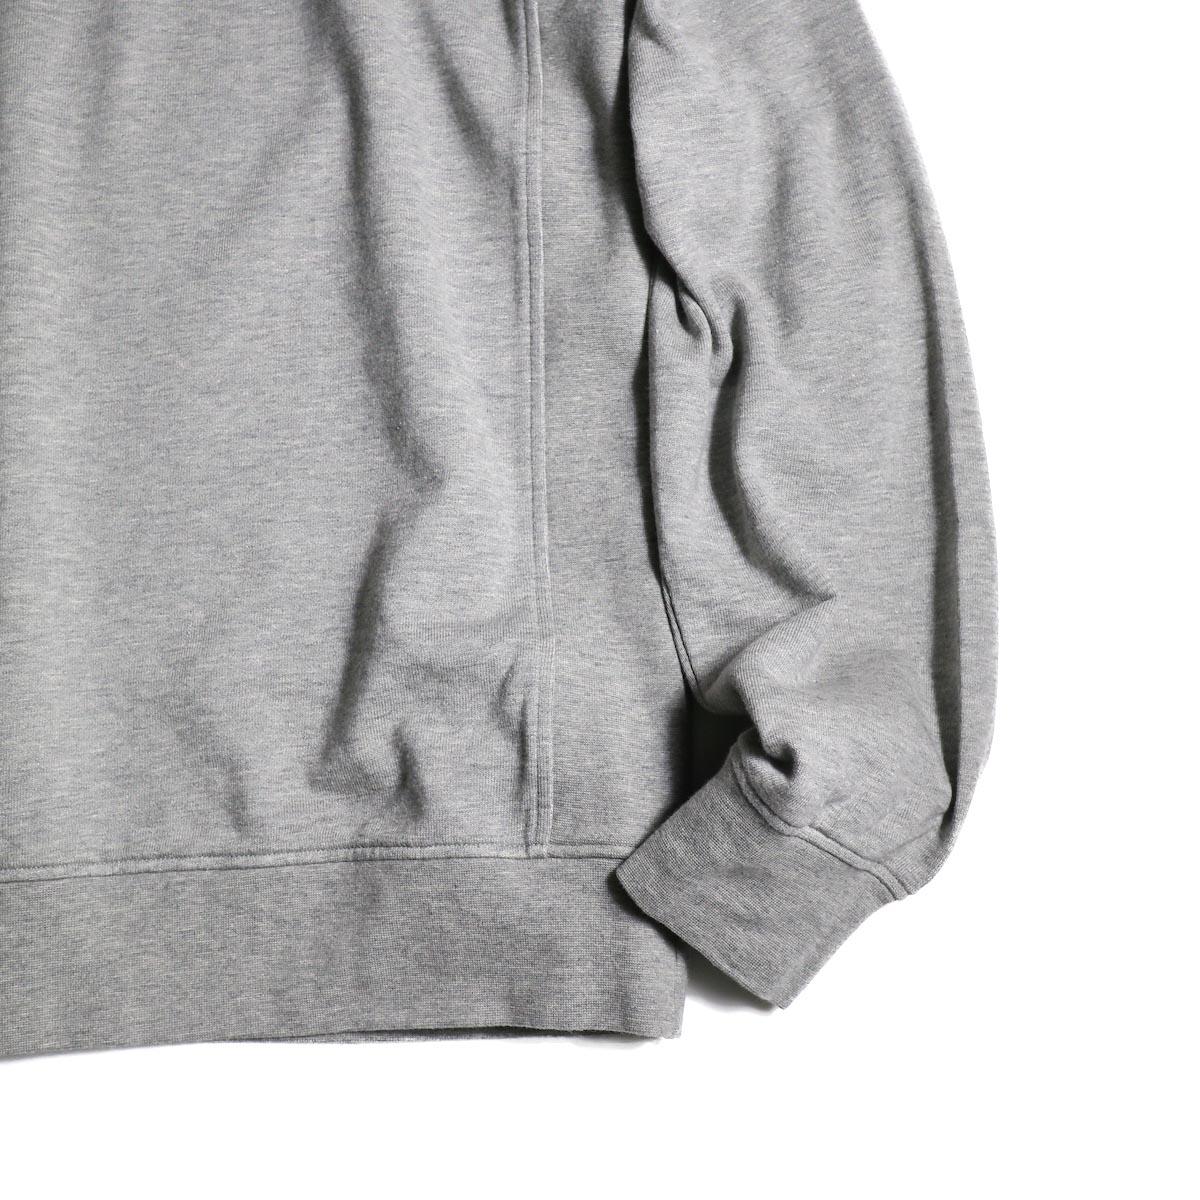 visvim / JV CREW L/S (Gray) 袖、裾